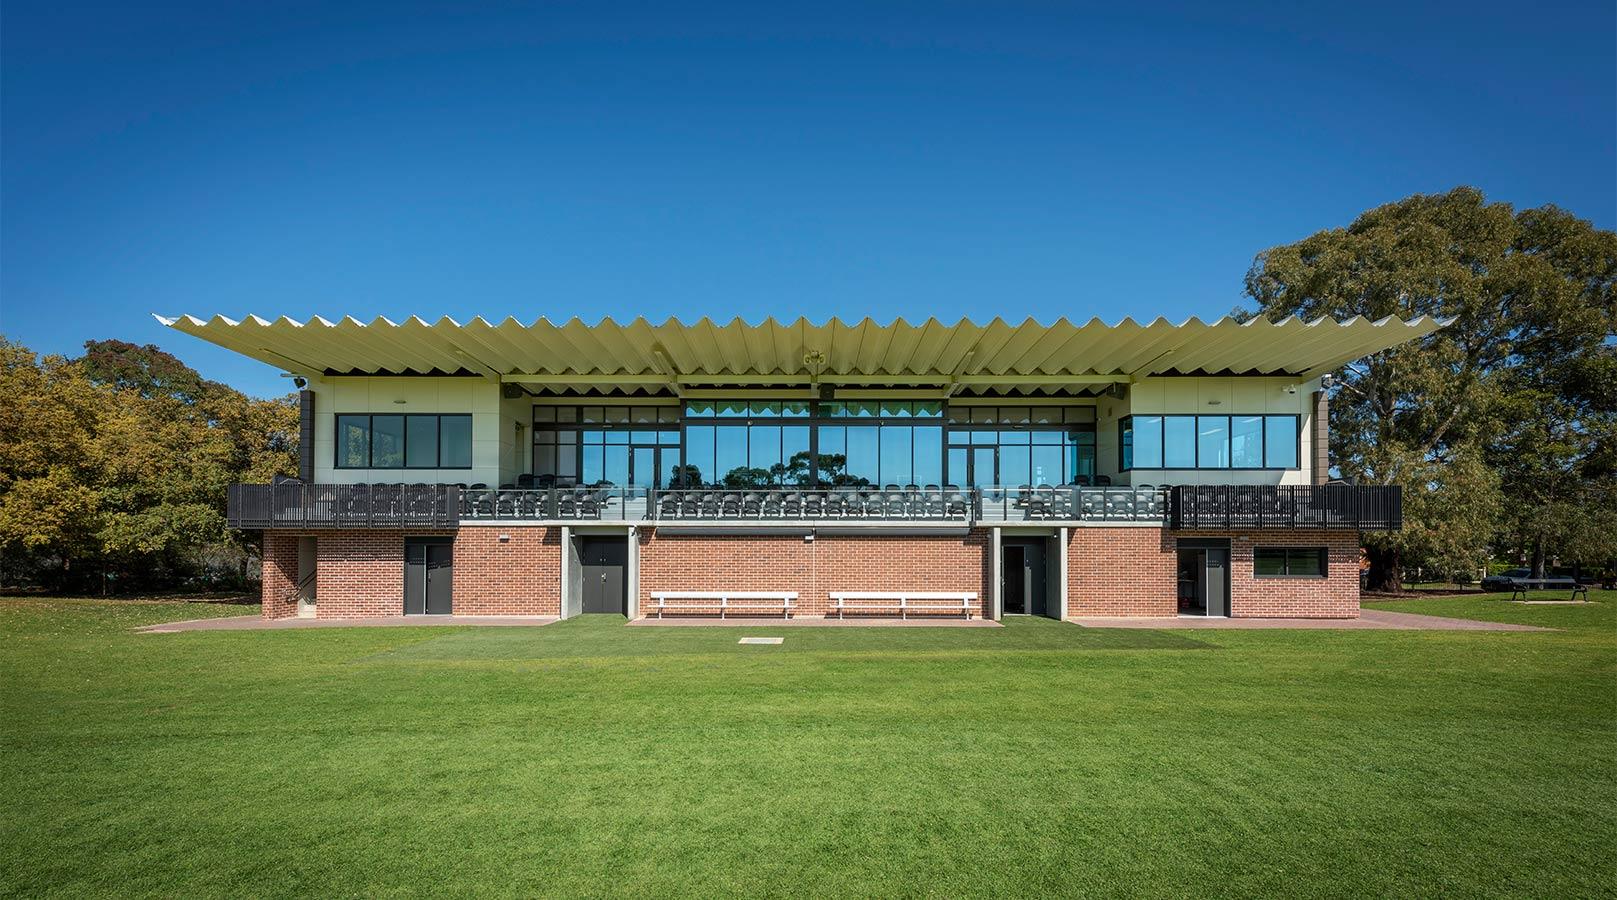 schiavello construction adelaide goodwood oval sport stadium football cricket grandstand exterior